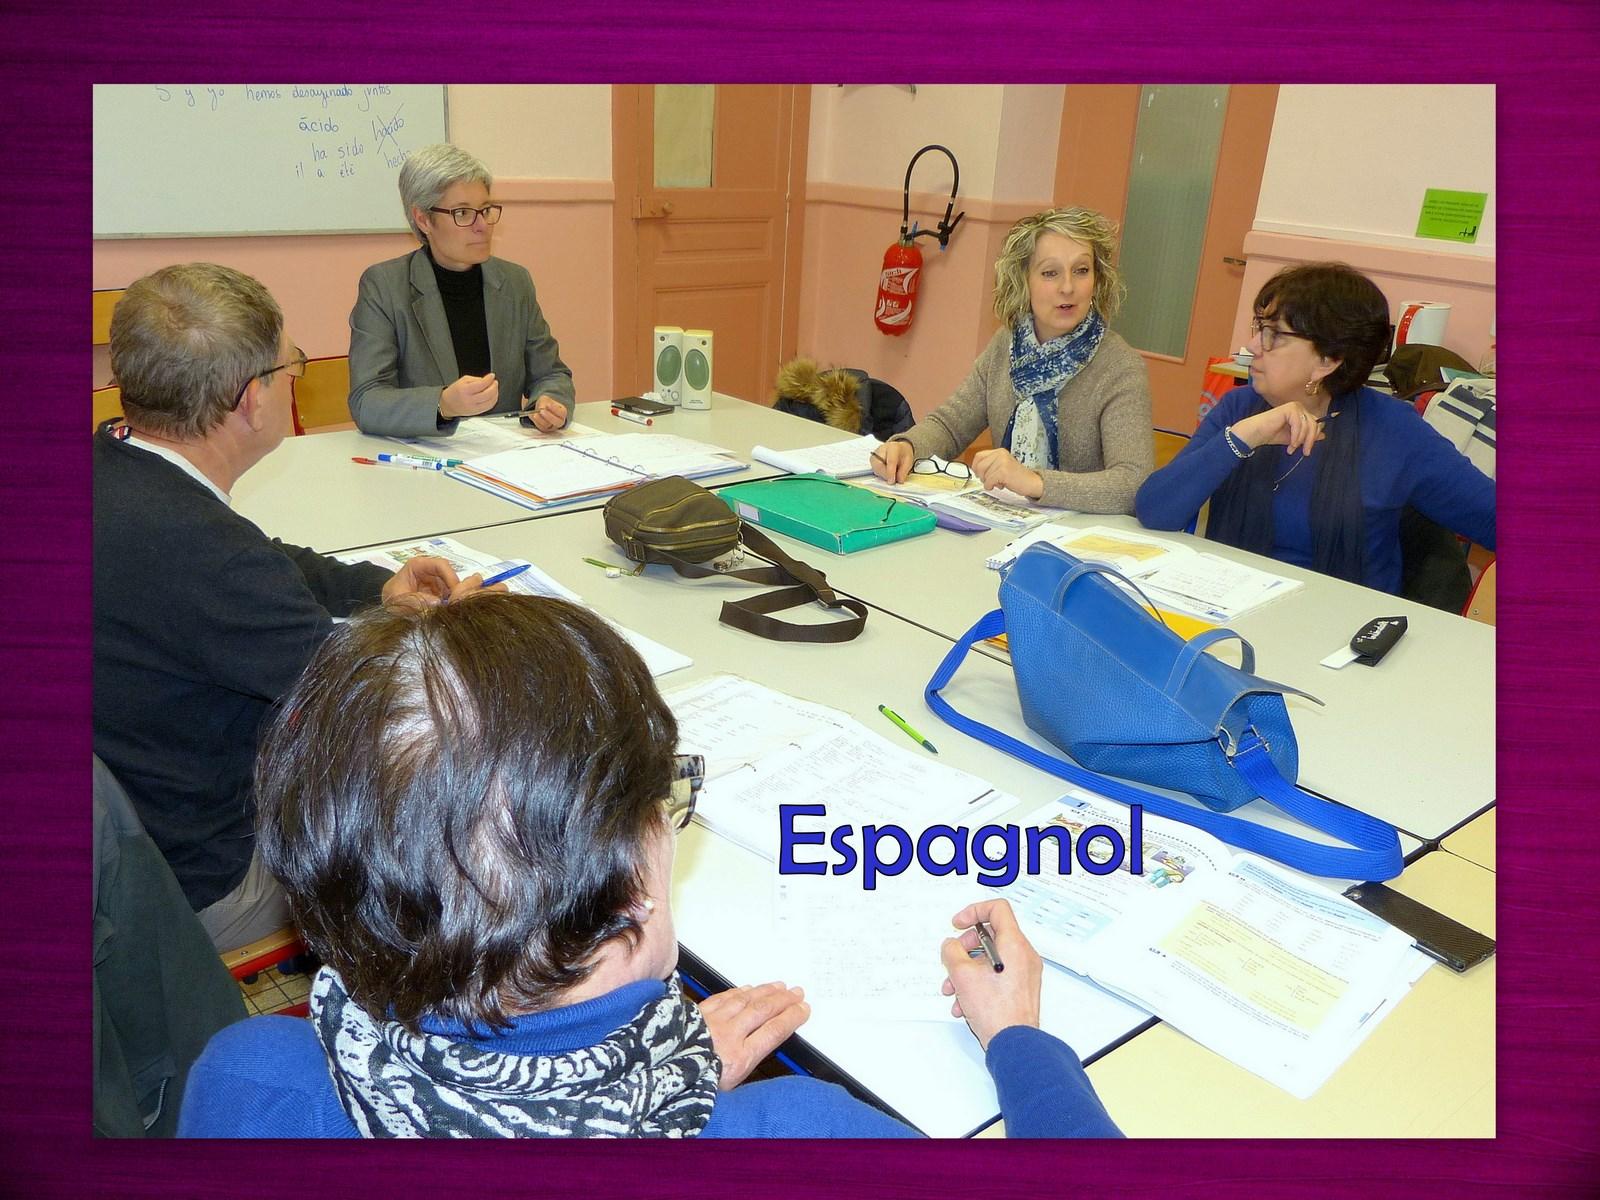 Espagnol (1)